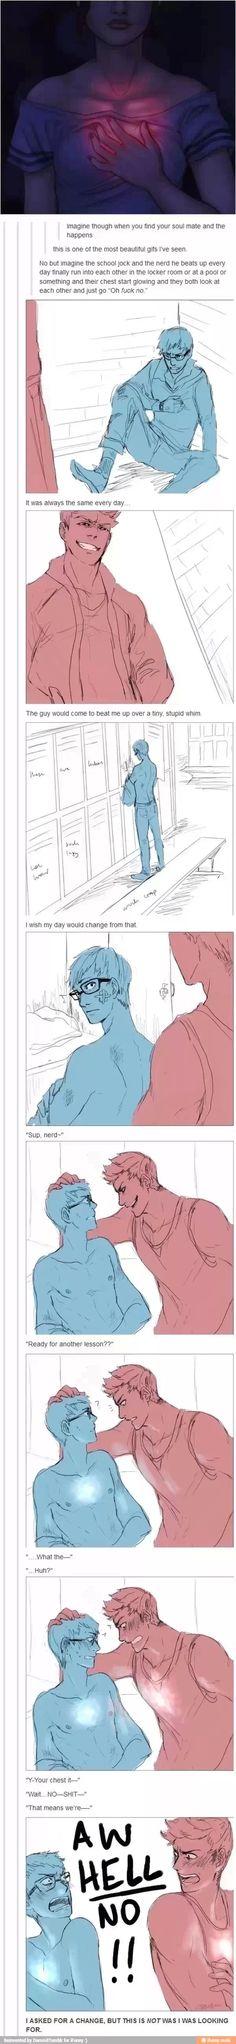 Tumblr funny/ AWSOMESAUSE